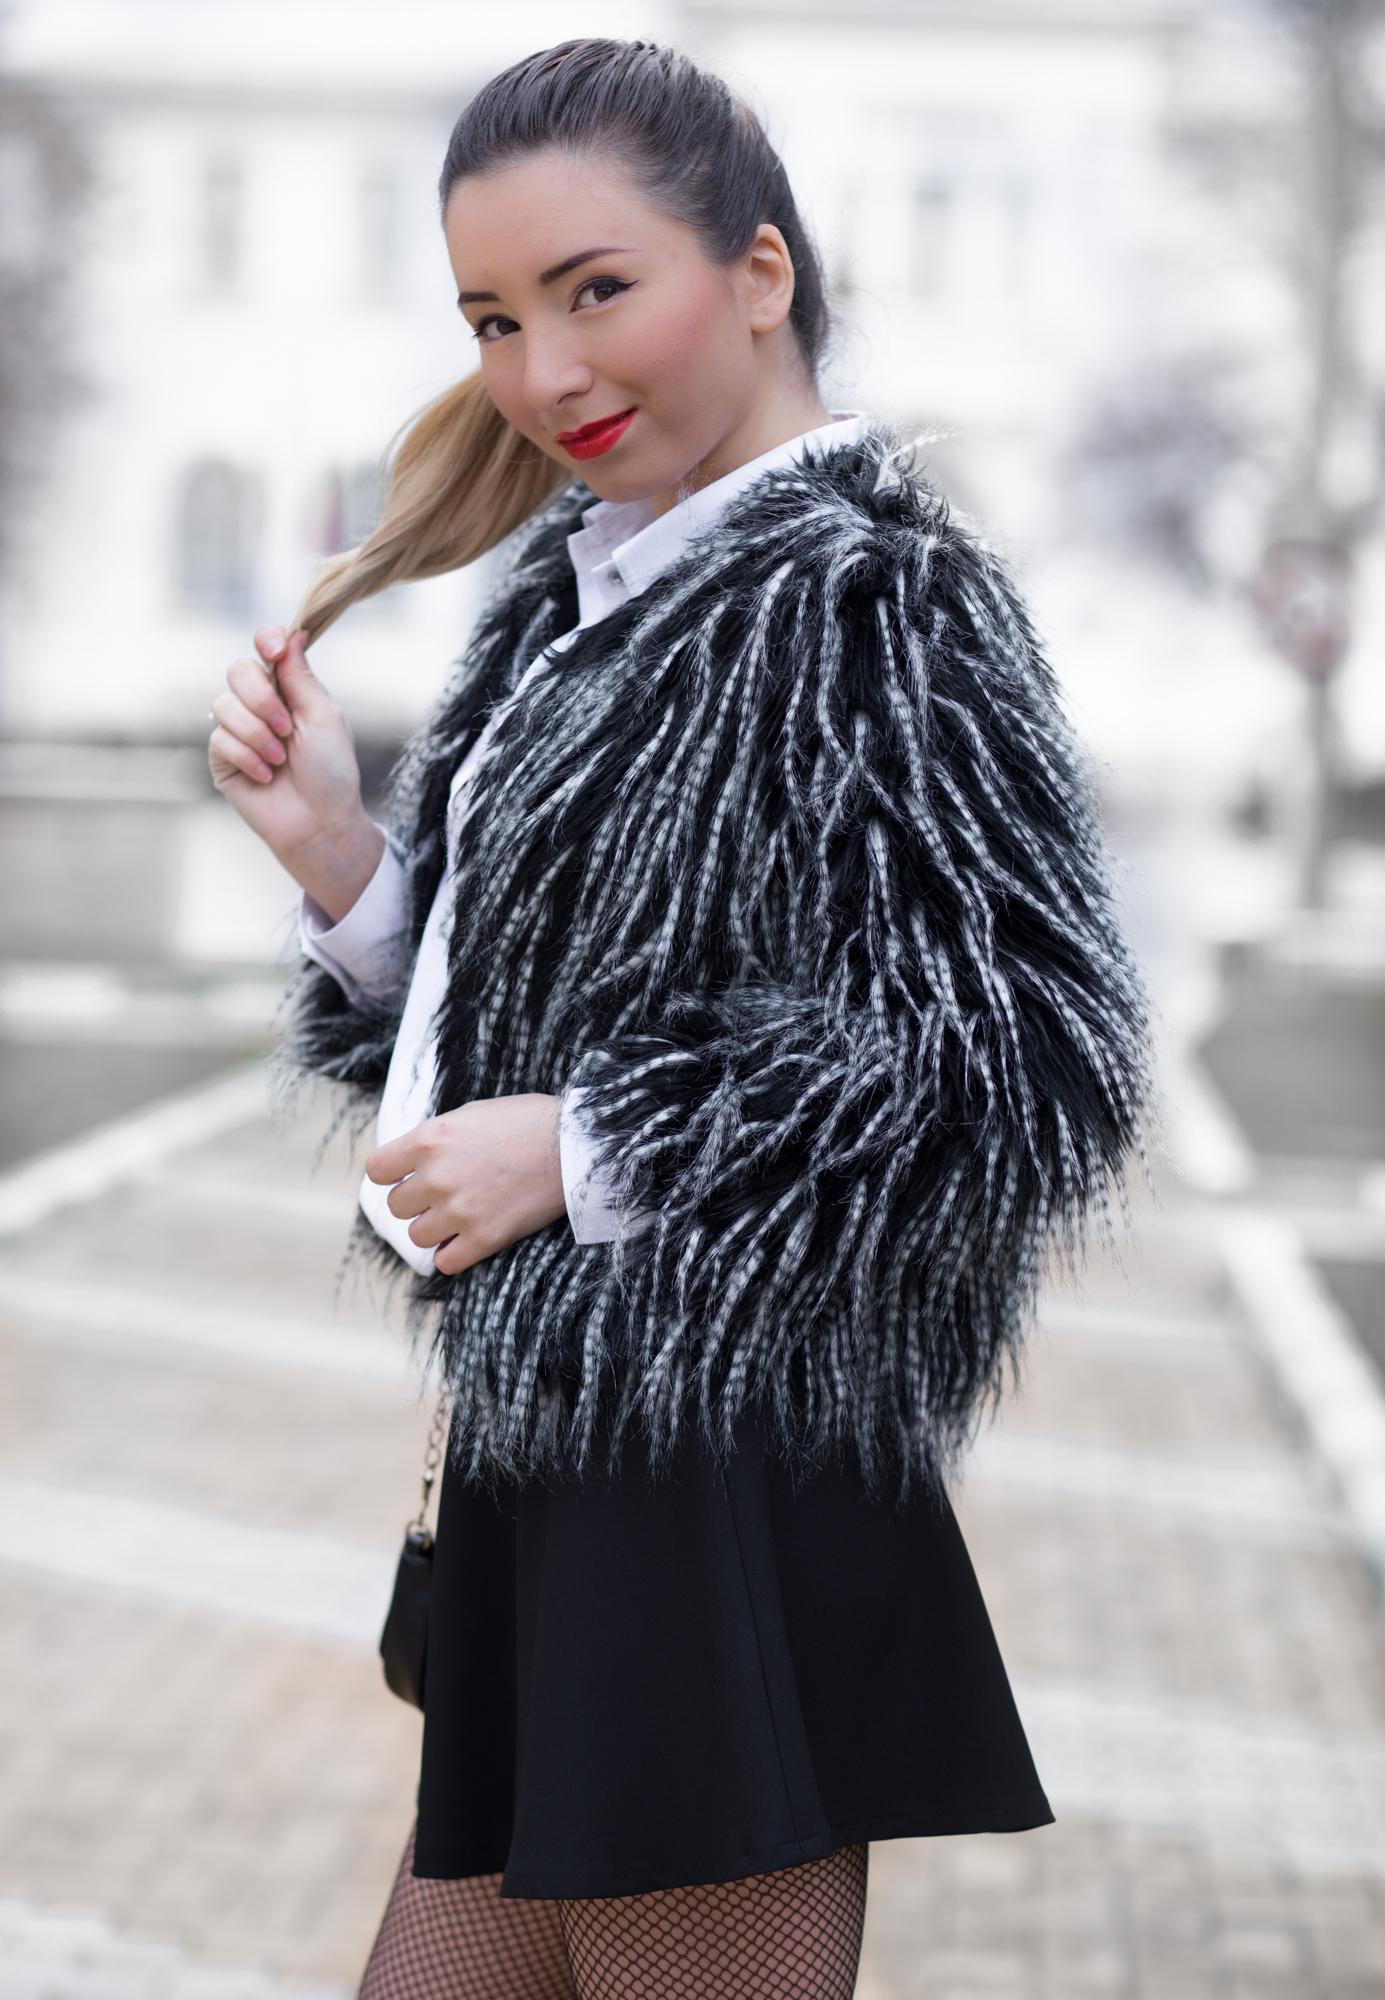 Andreea Ristea - cum purtam blana artificiala?